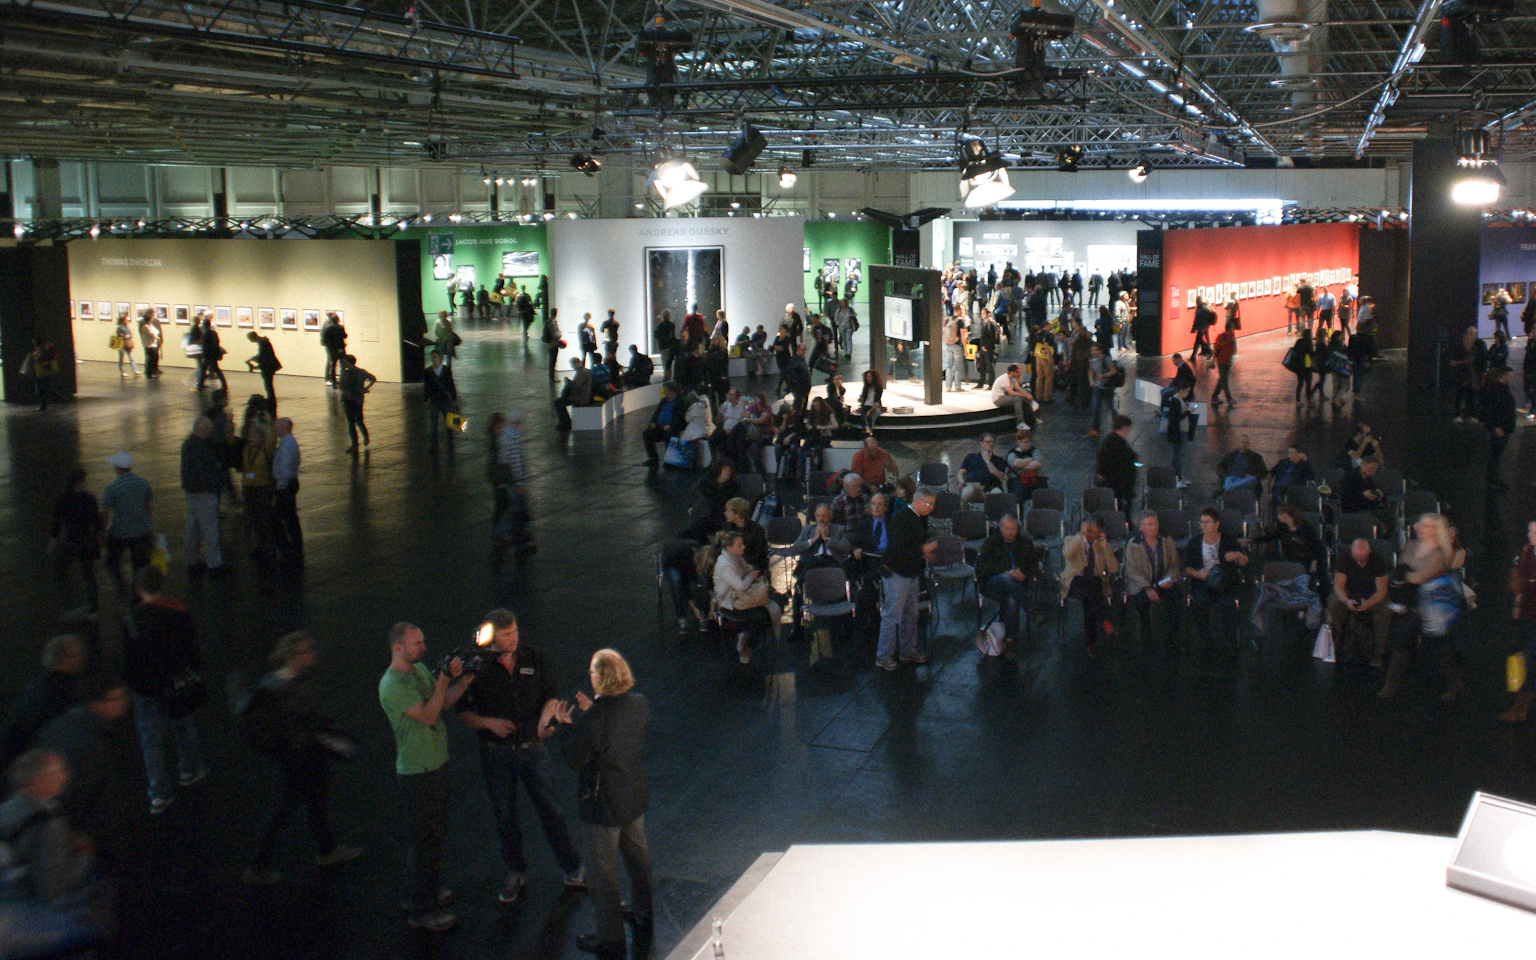 File:Photokina 2012, Leica Galerie.jpg - Wikimedia Commons